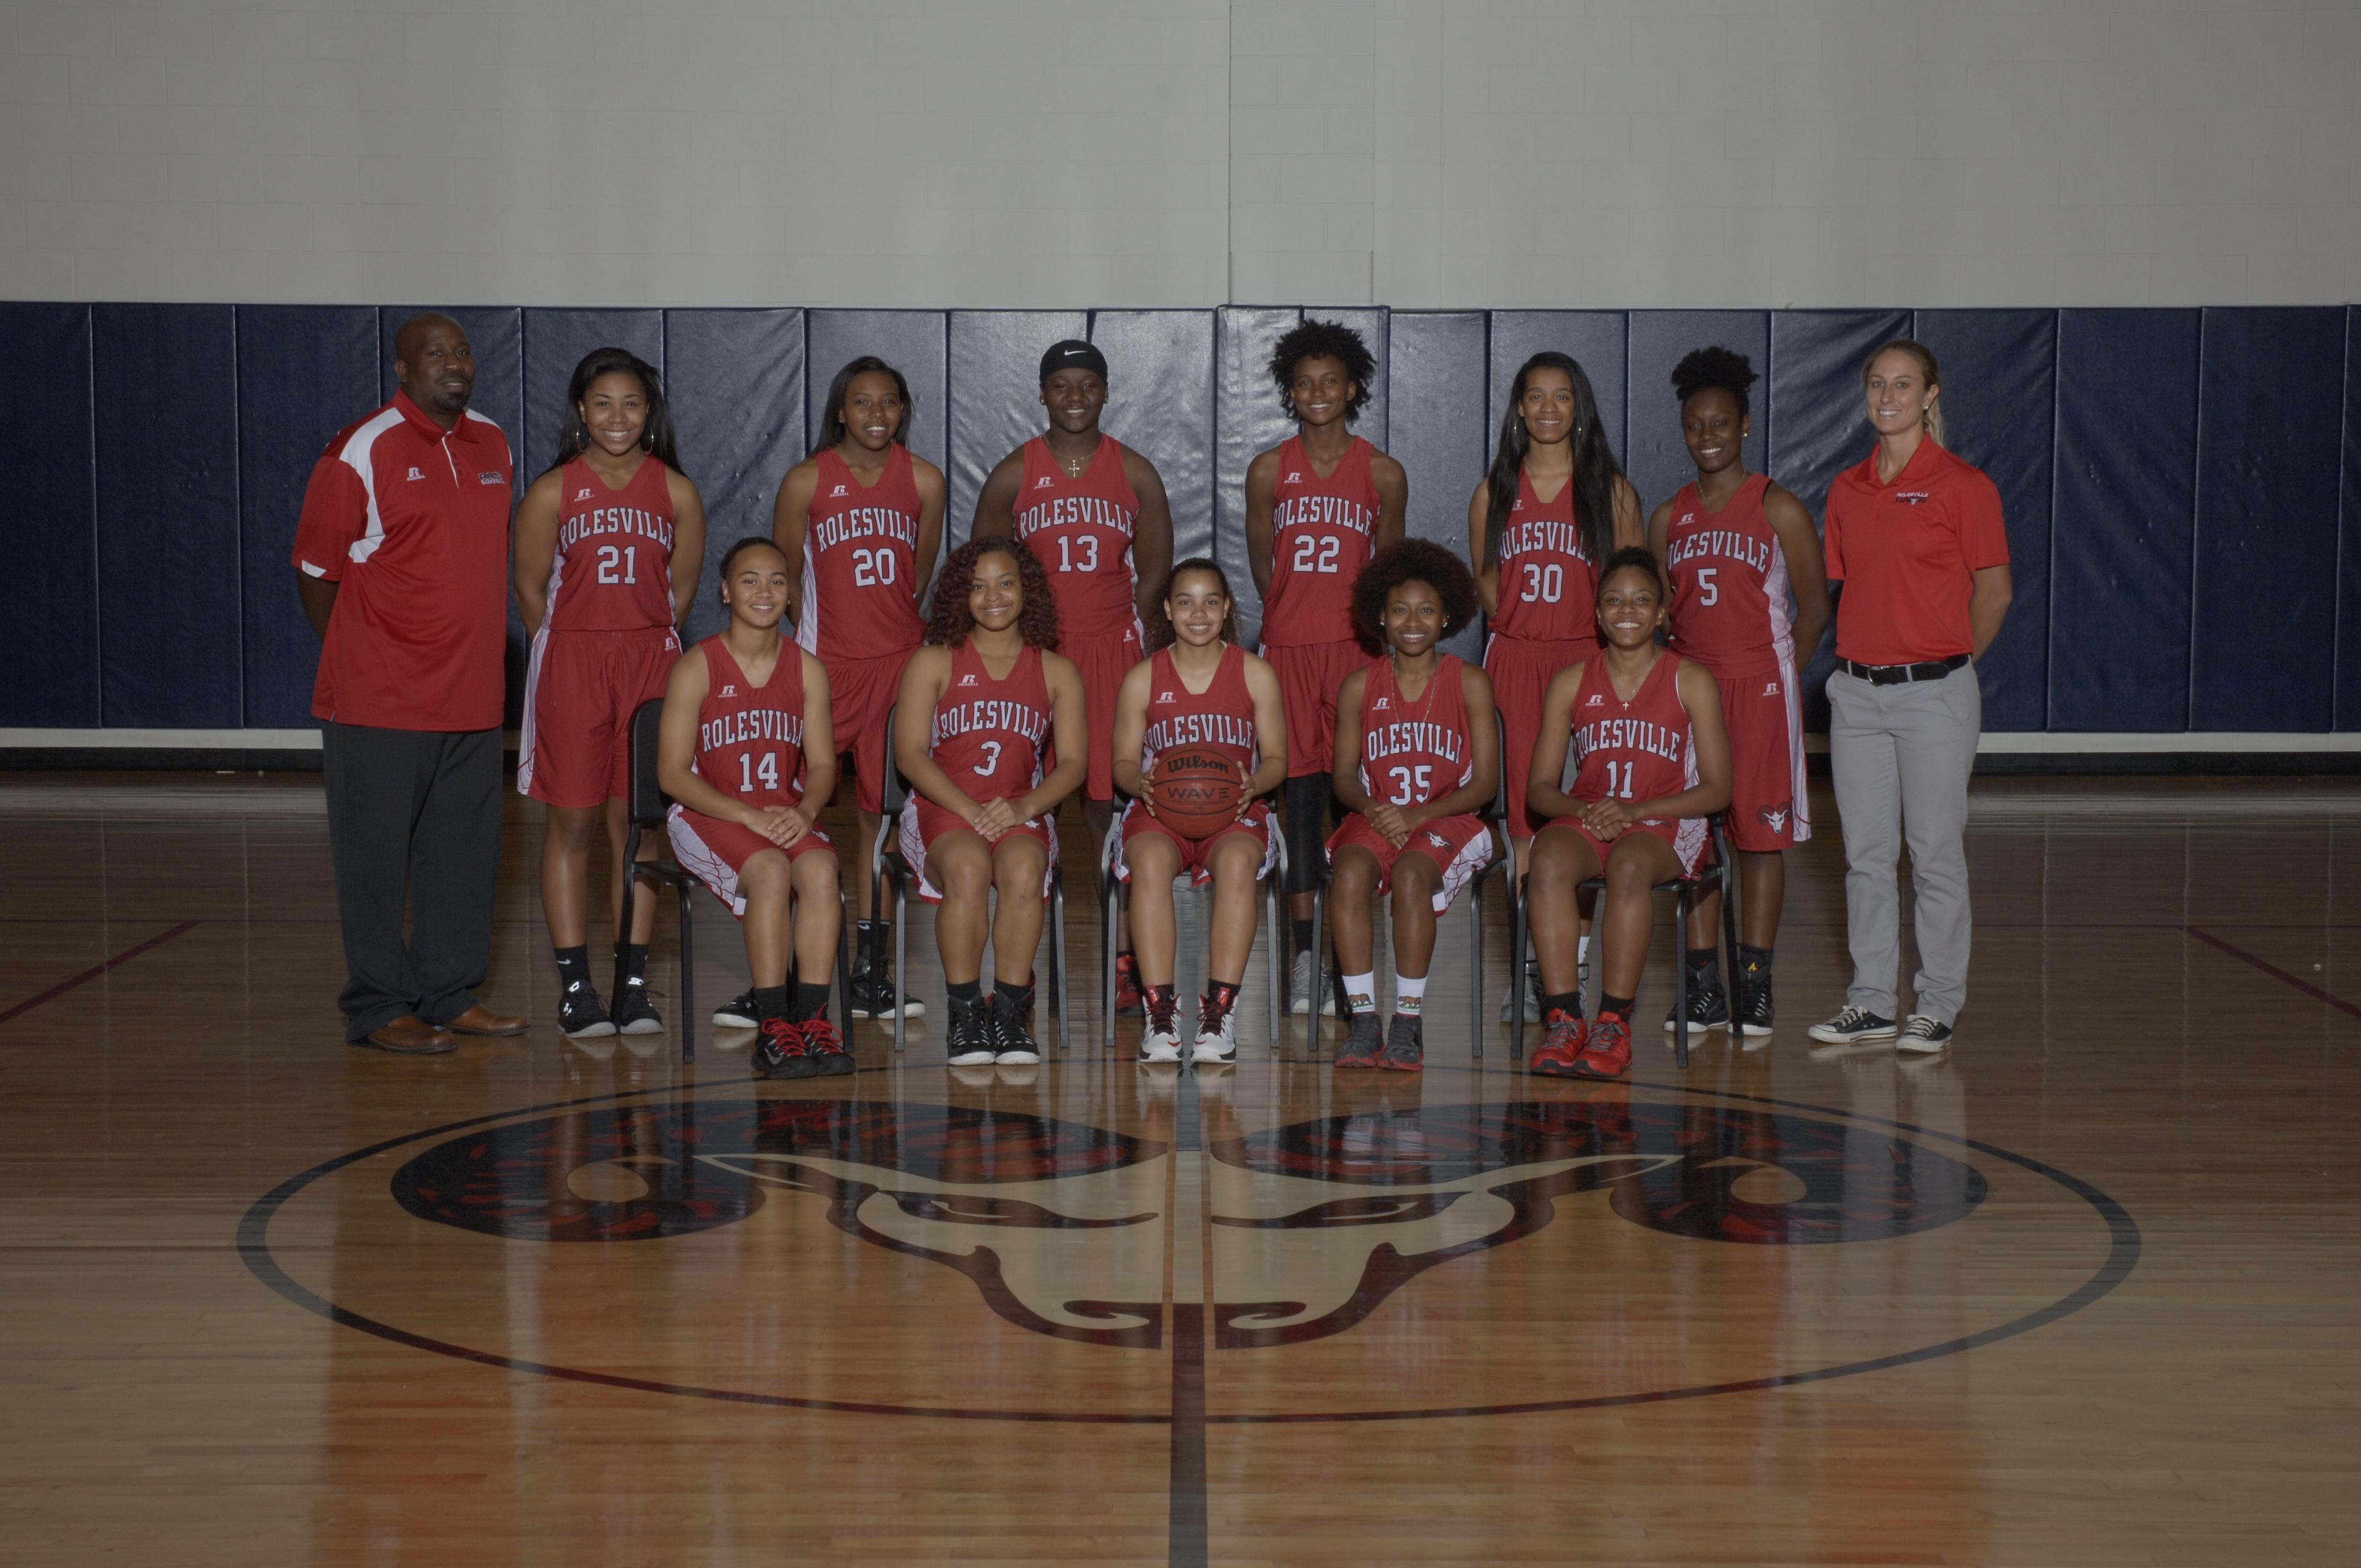 Women's Basketball team photo